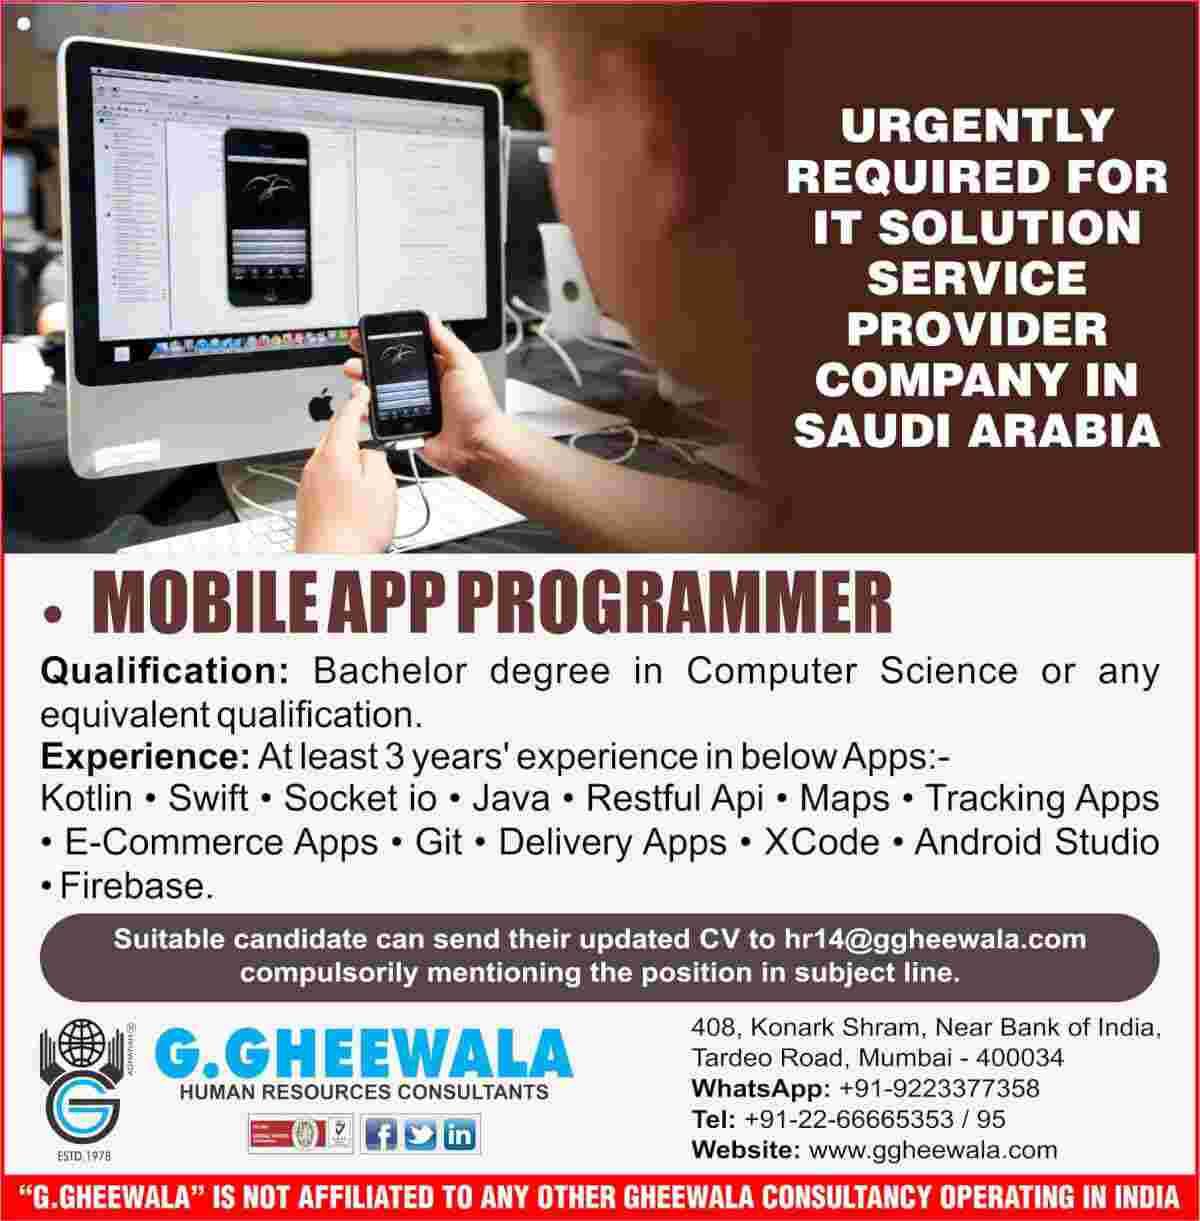 Gulf jobs Saudi Arabia – Urgent requirement of a Mobile App developer